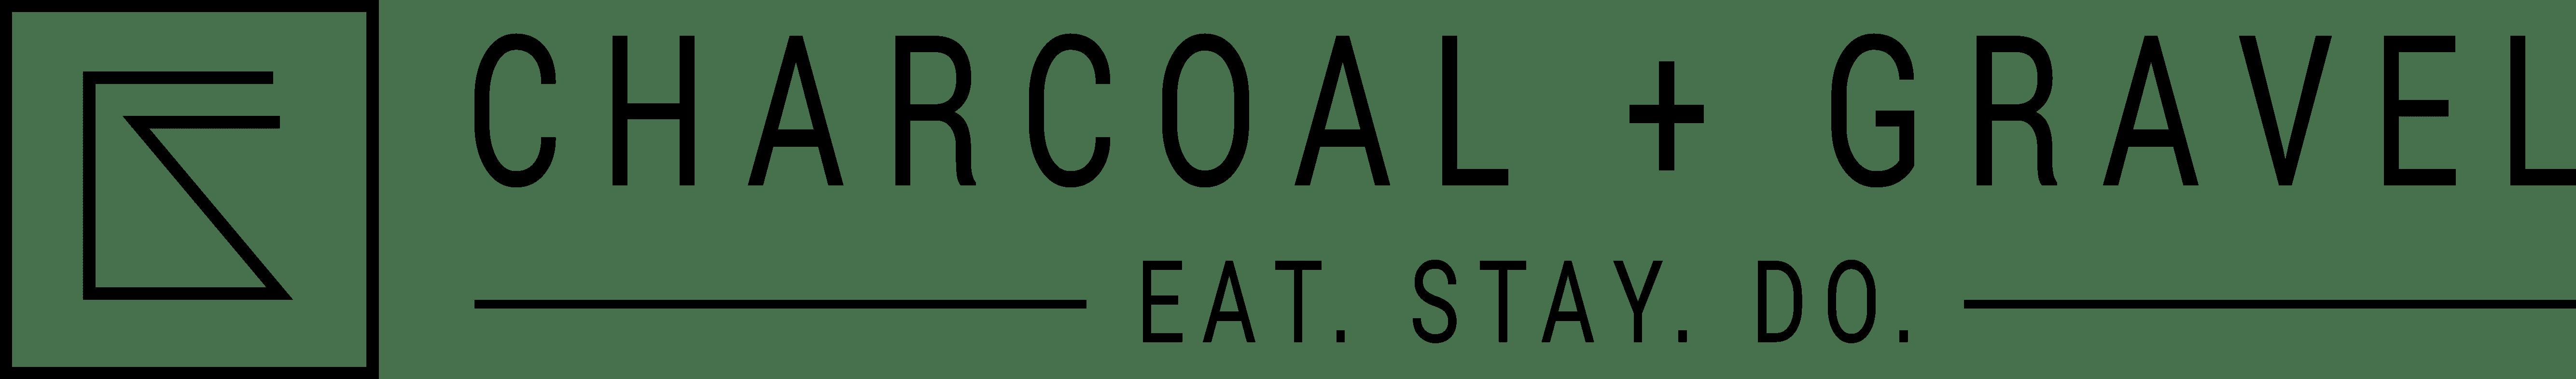 Charcoal + Gravel icon